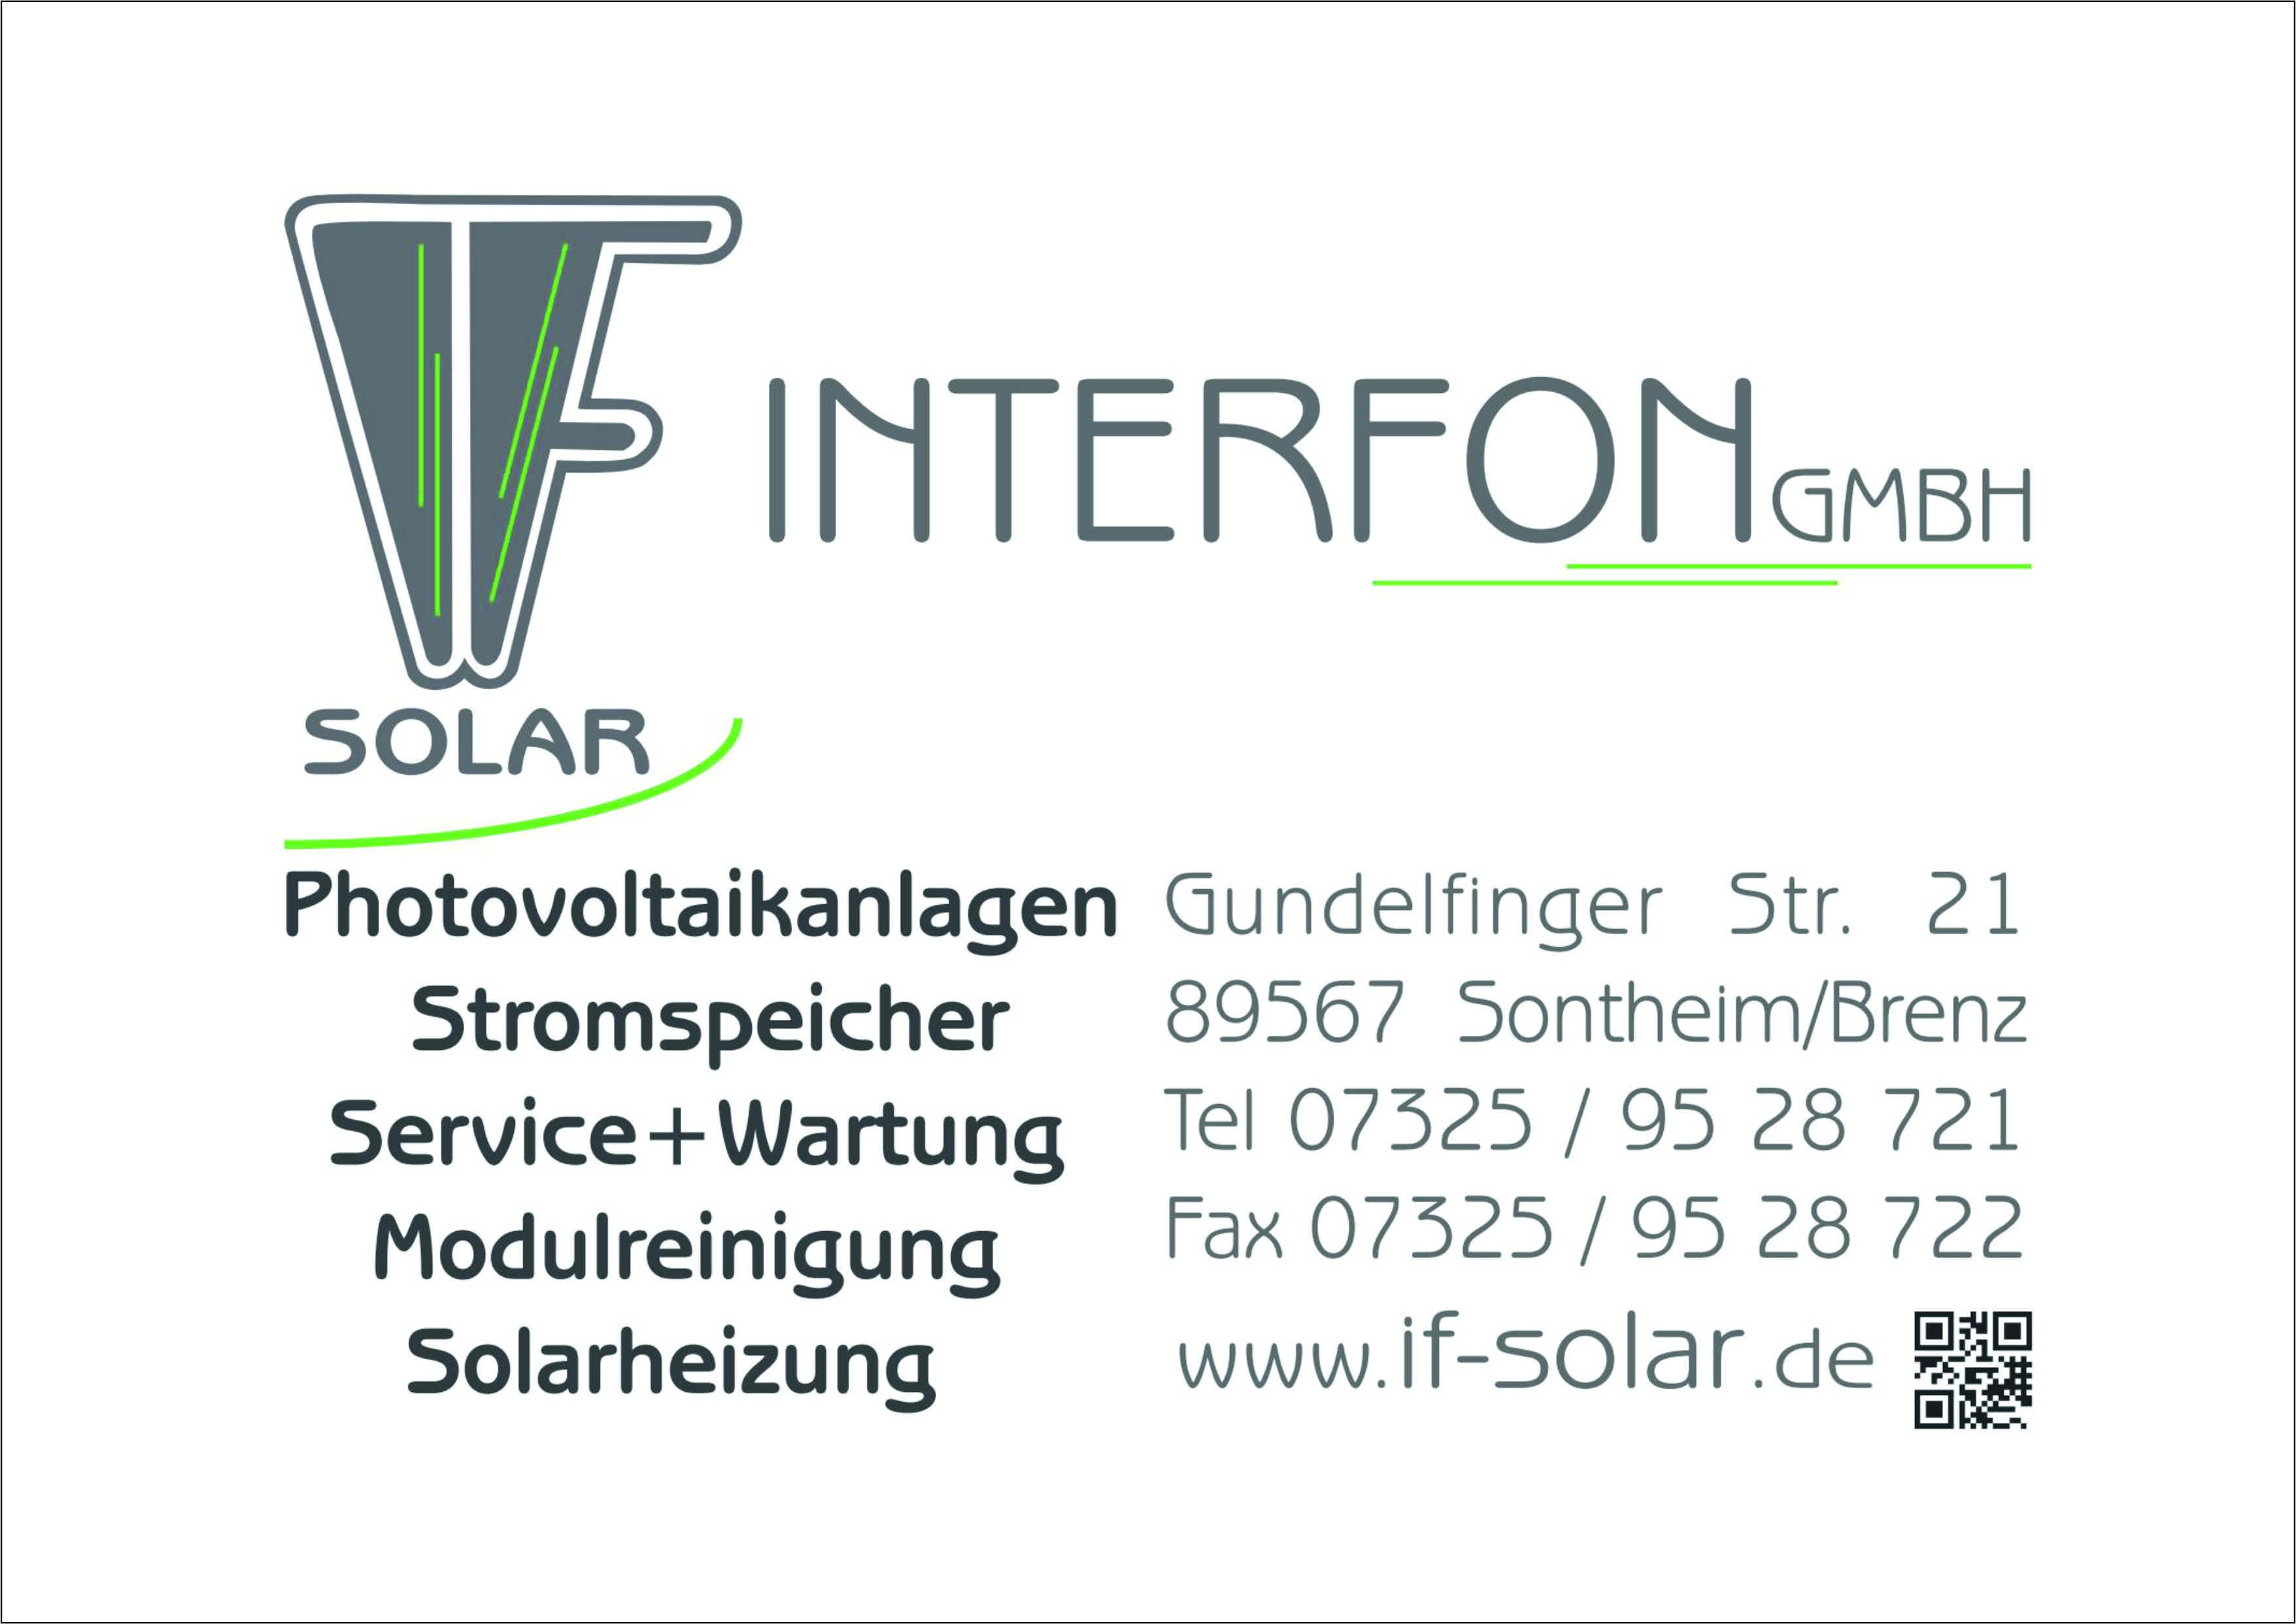 Interfon GmbH